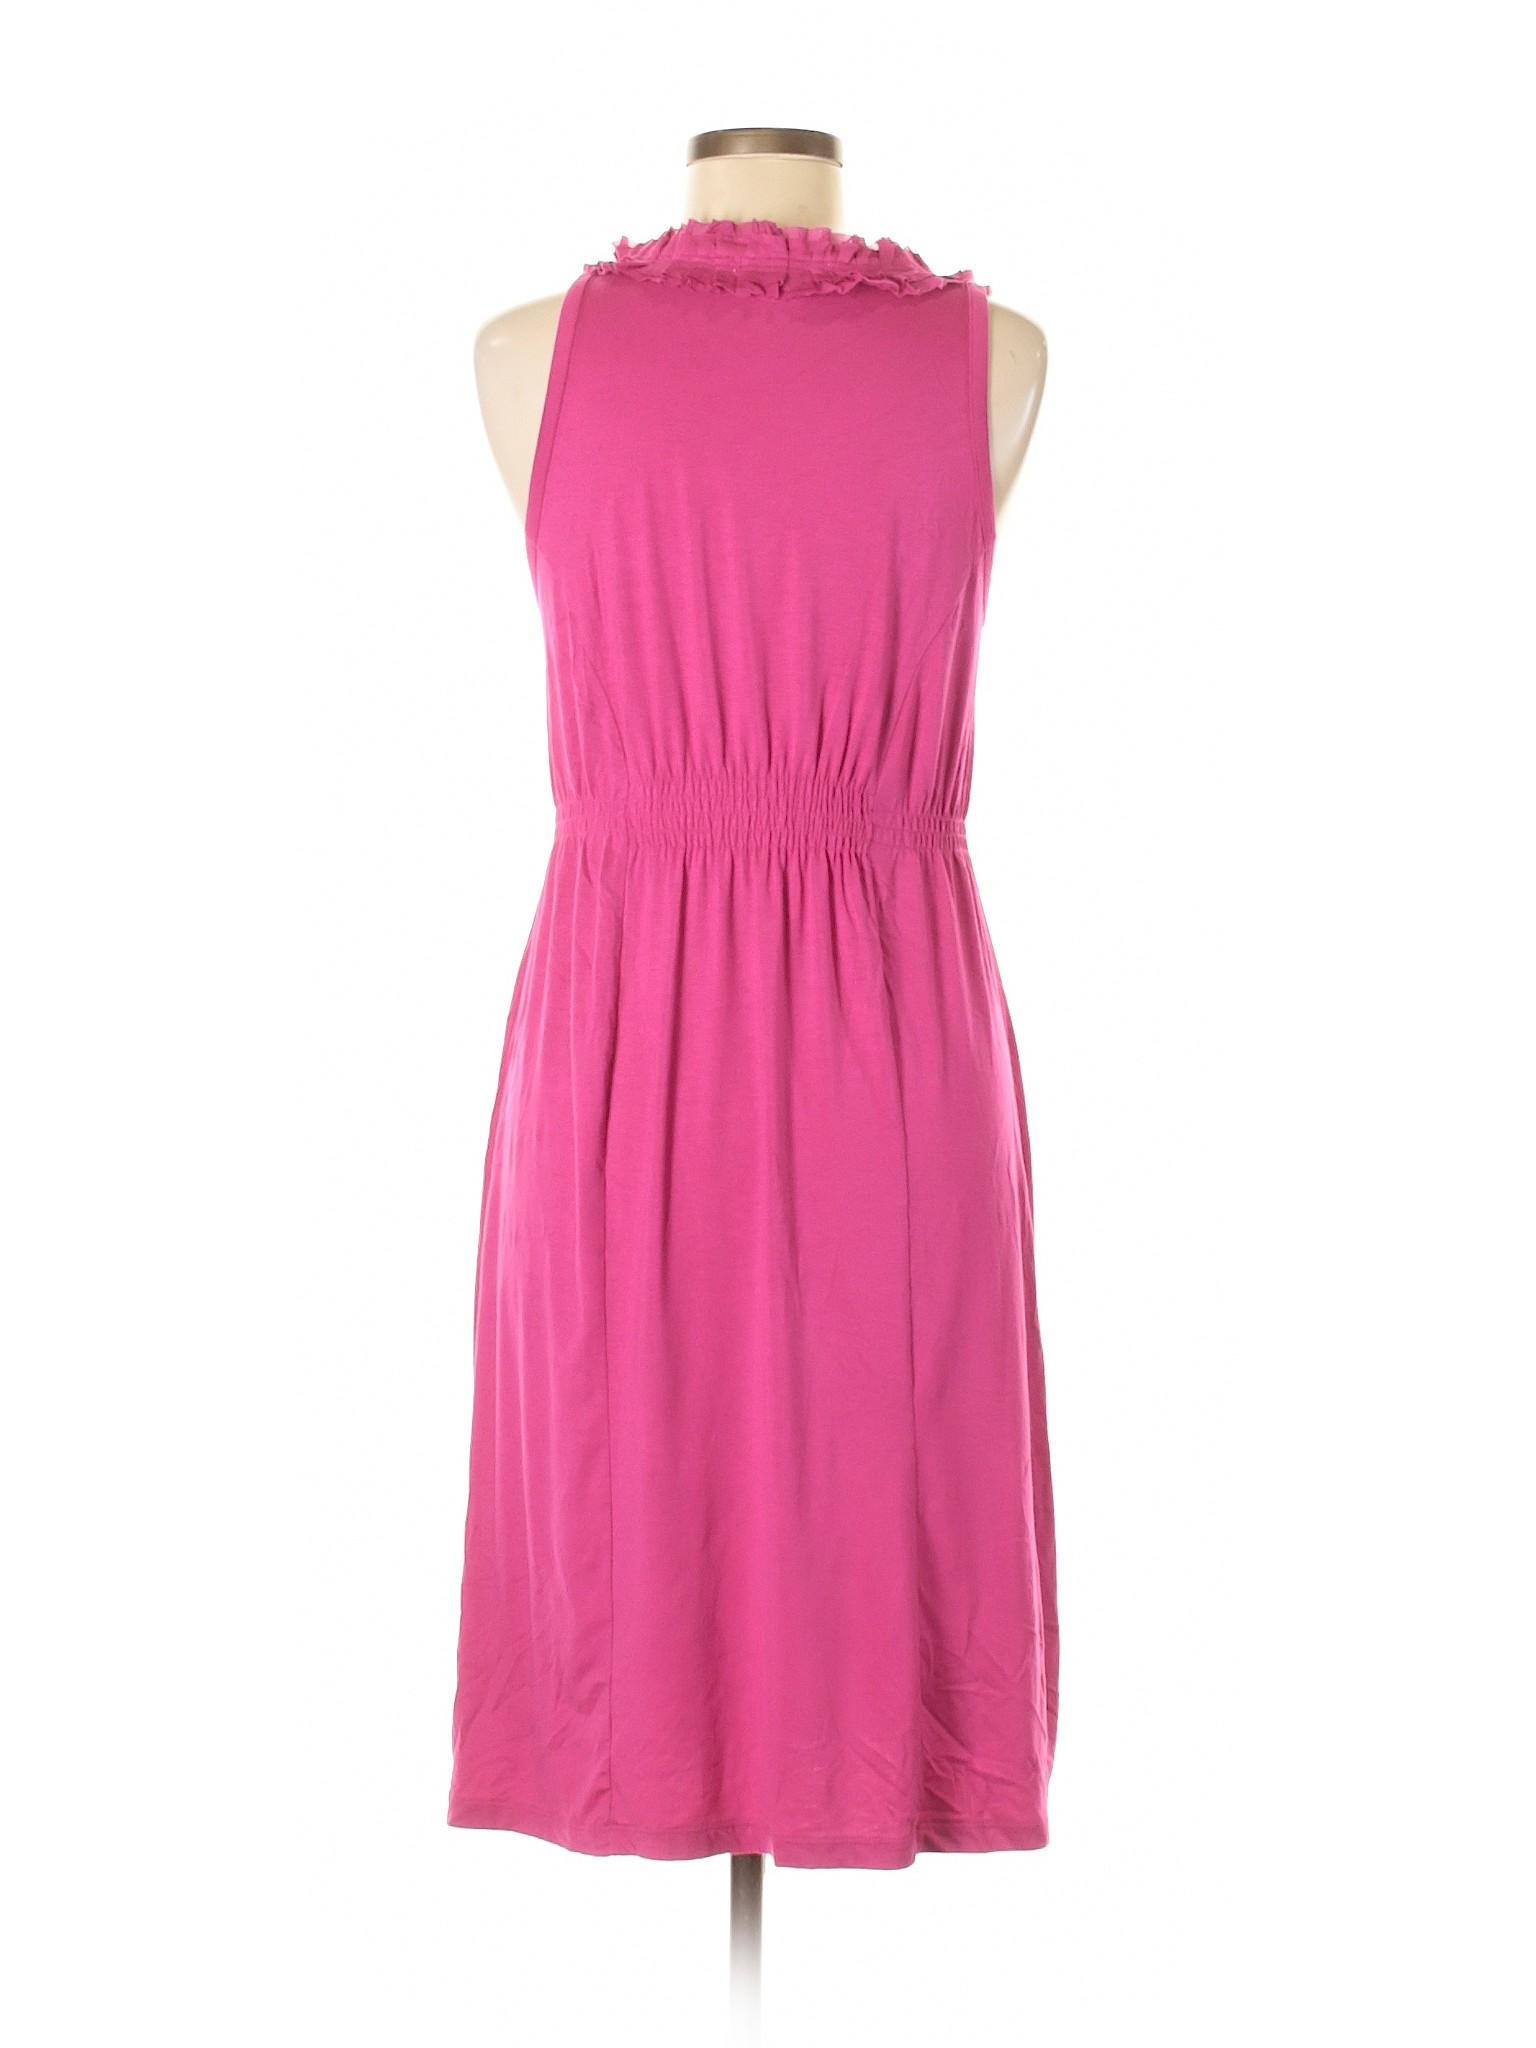 winter Republic Casual Banana Dress Boutique x0qwg11Zd